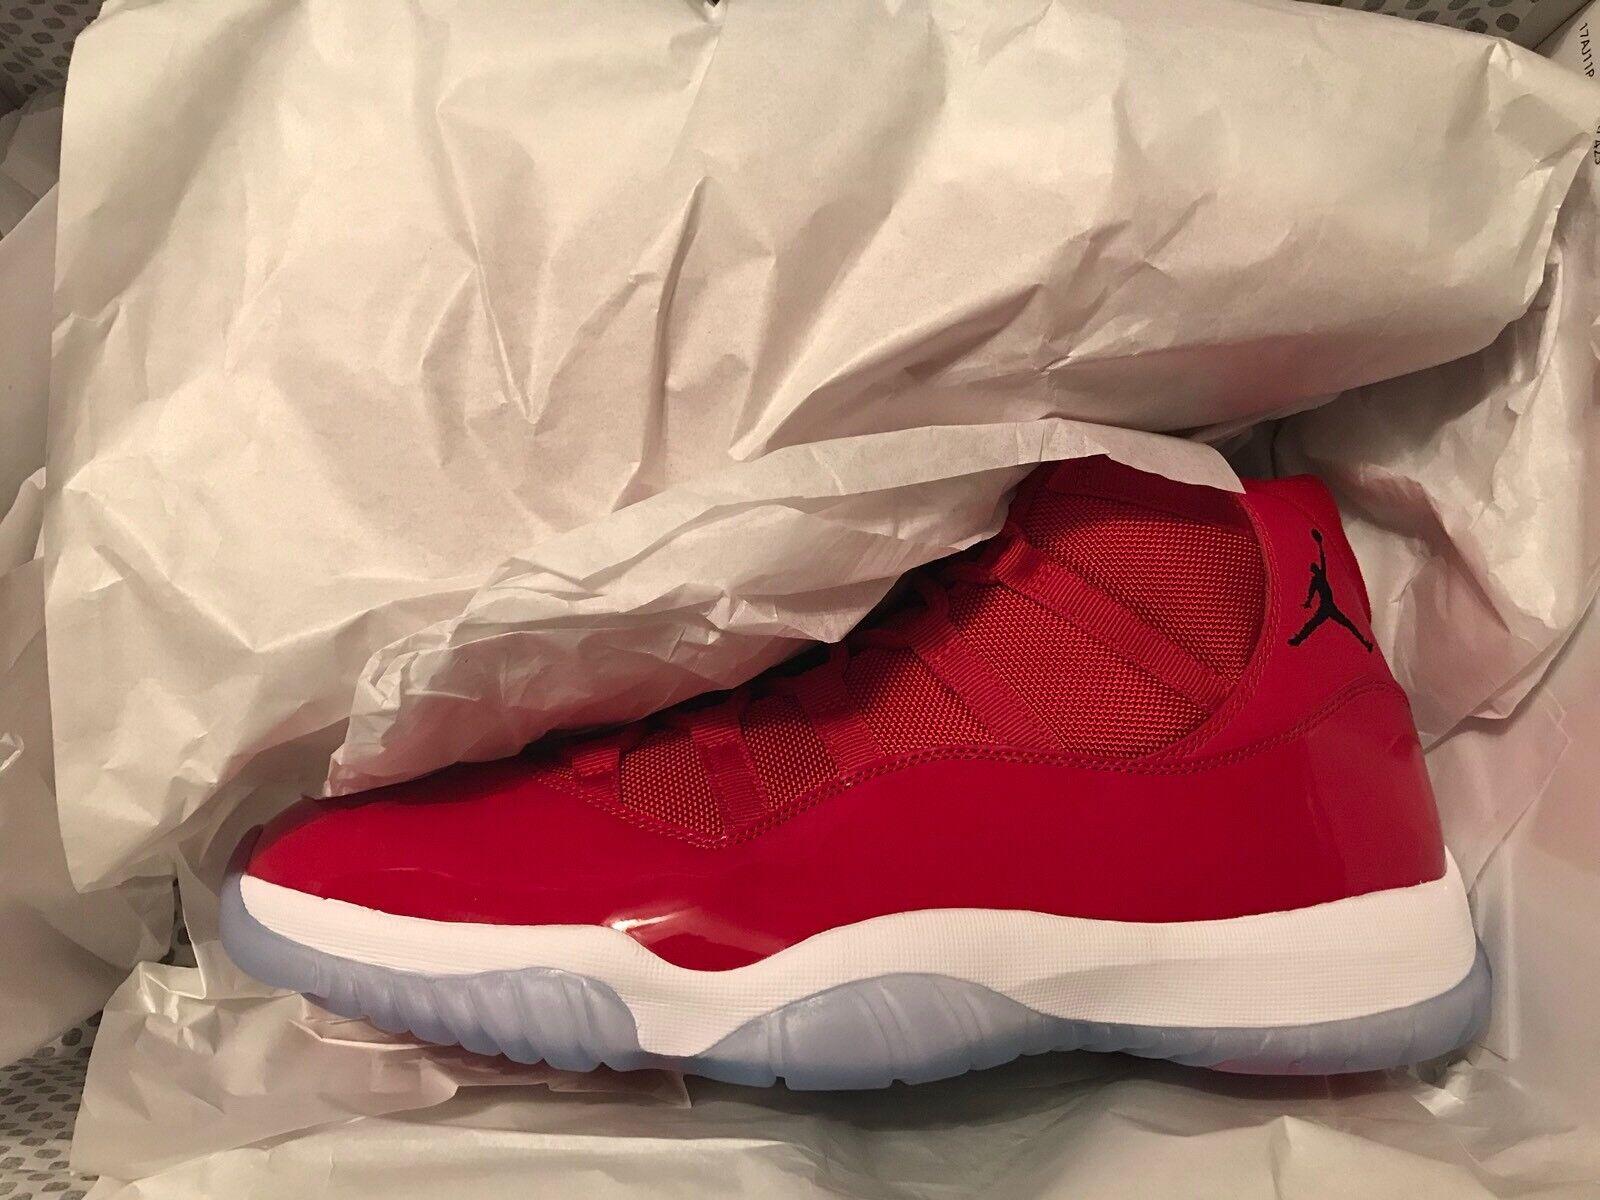 2017 Nike Air Jordan XI Retro 11 WIN LIKE '96  Gym Red  378037-623 Size 13 New